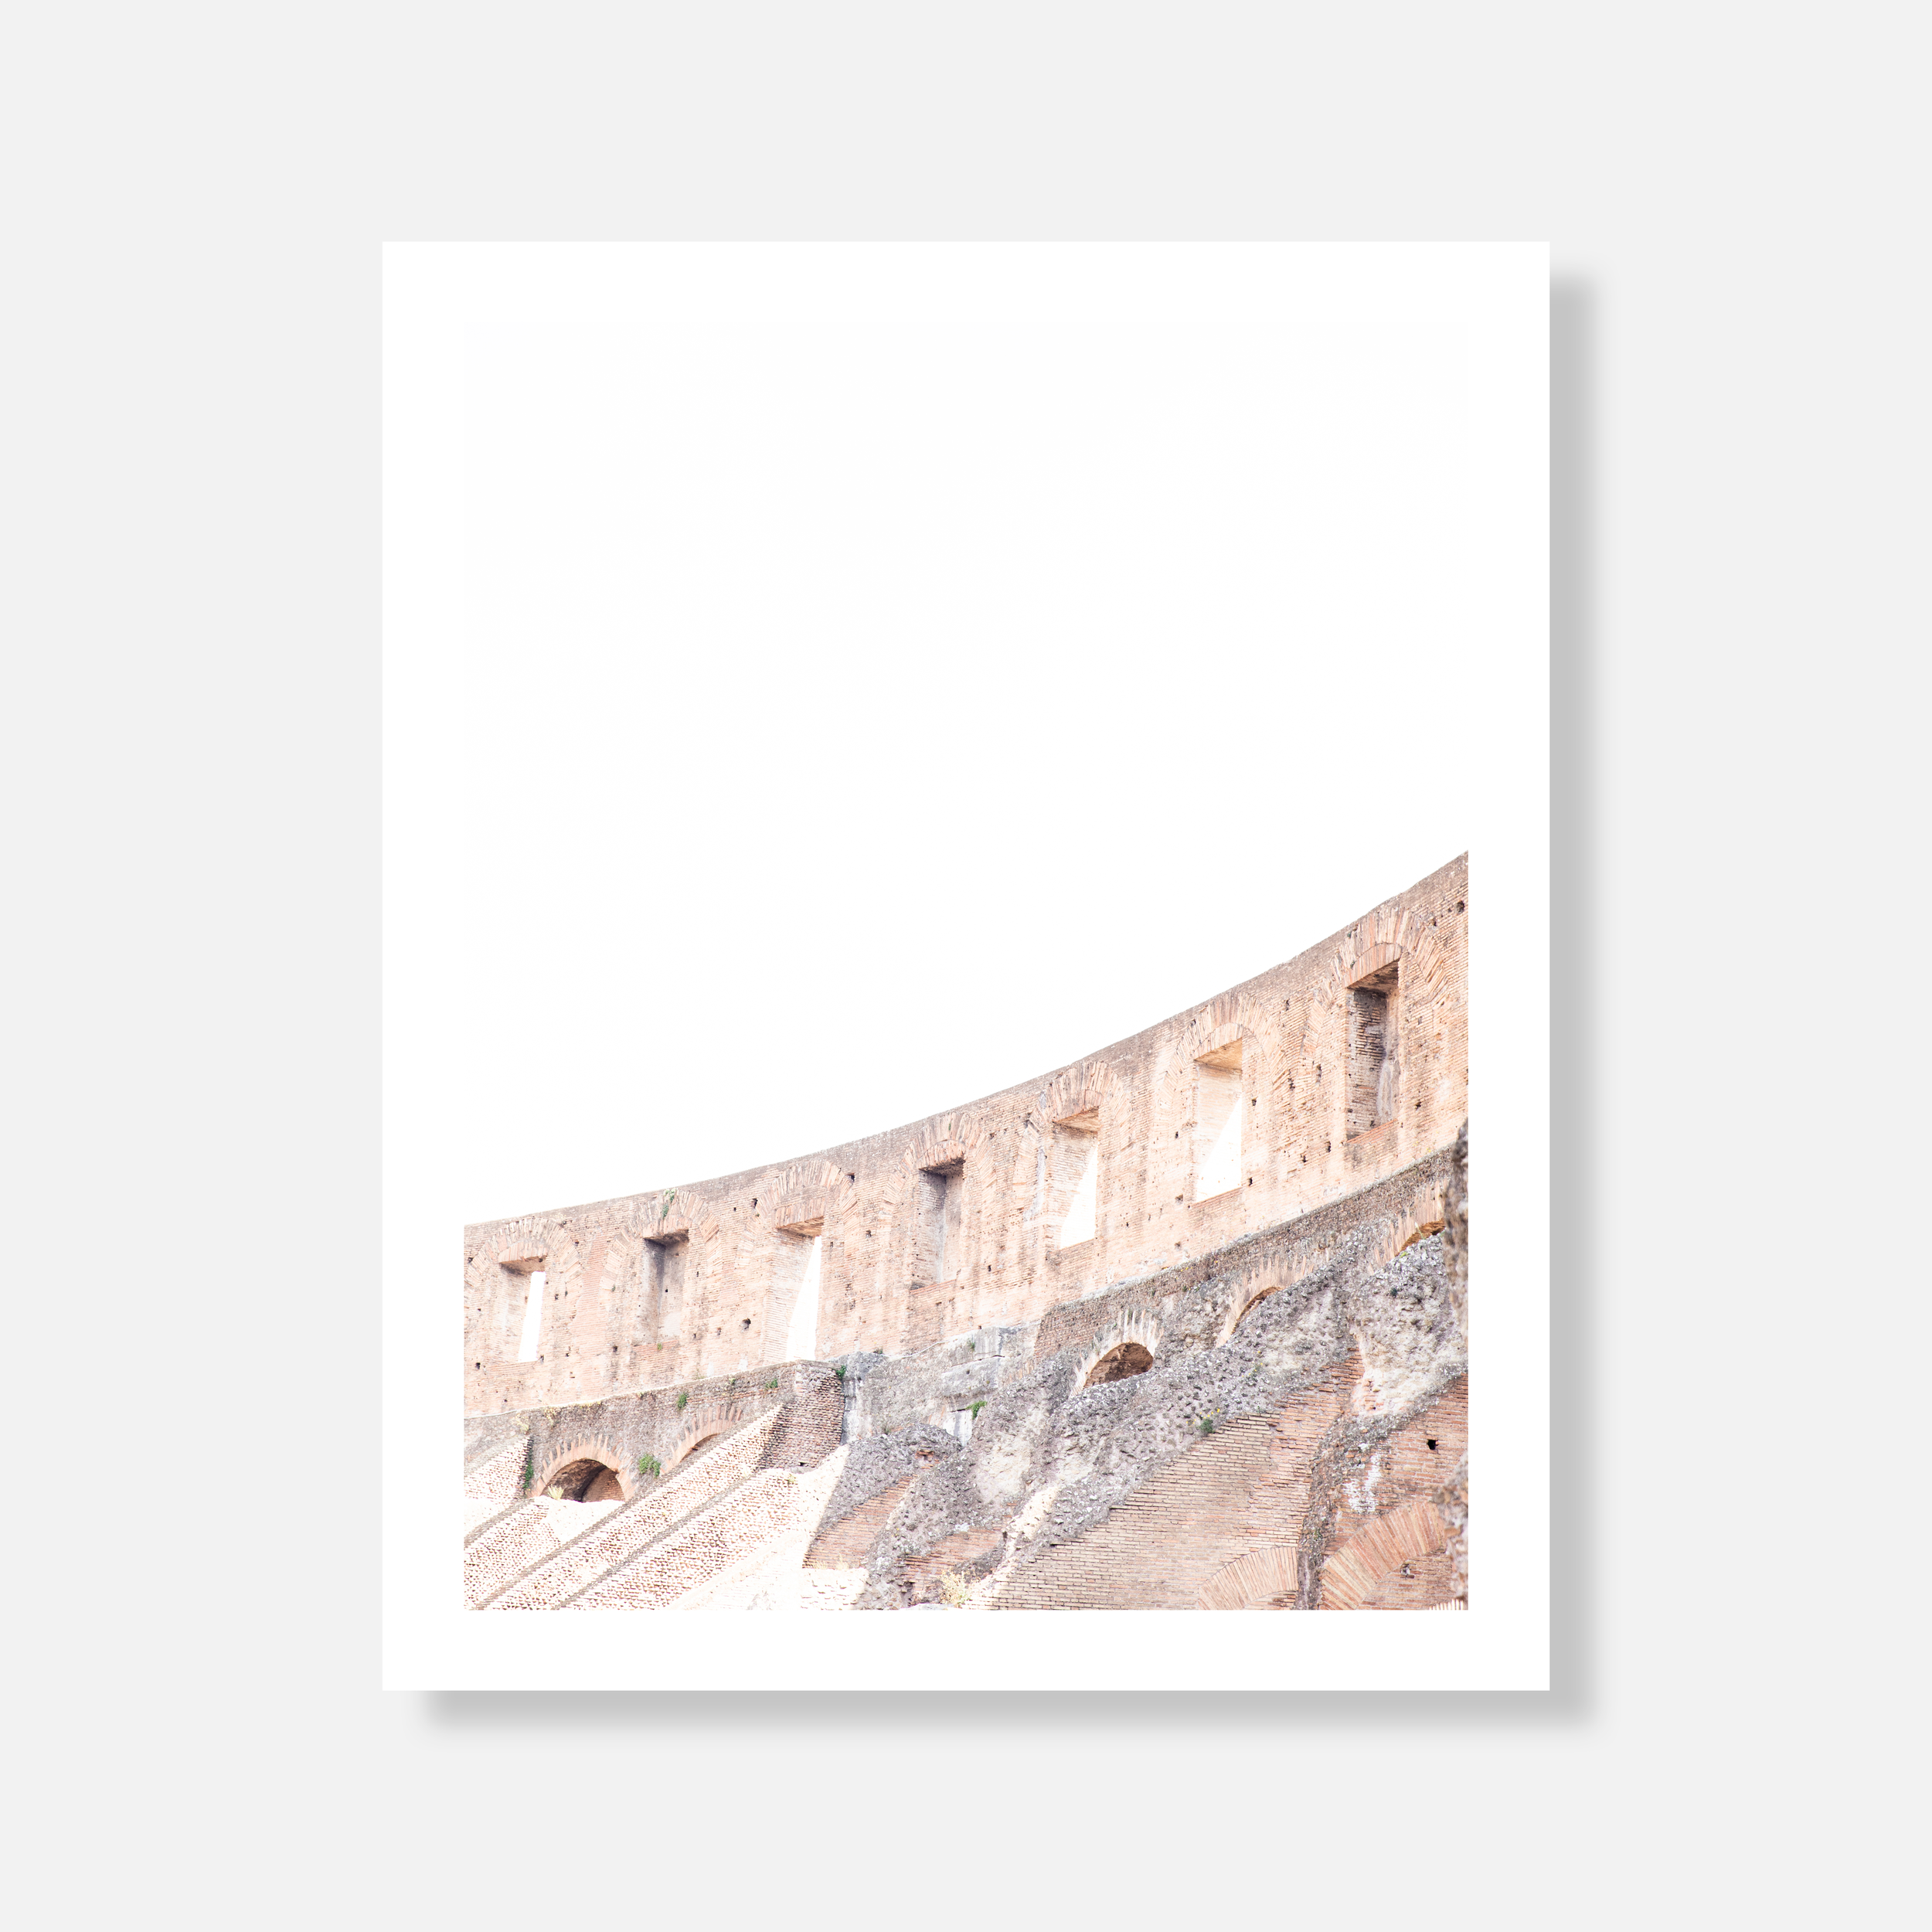 colosseum-print-image.png